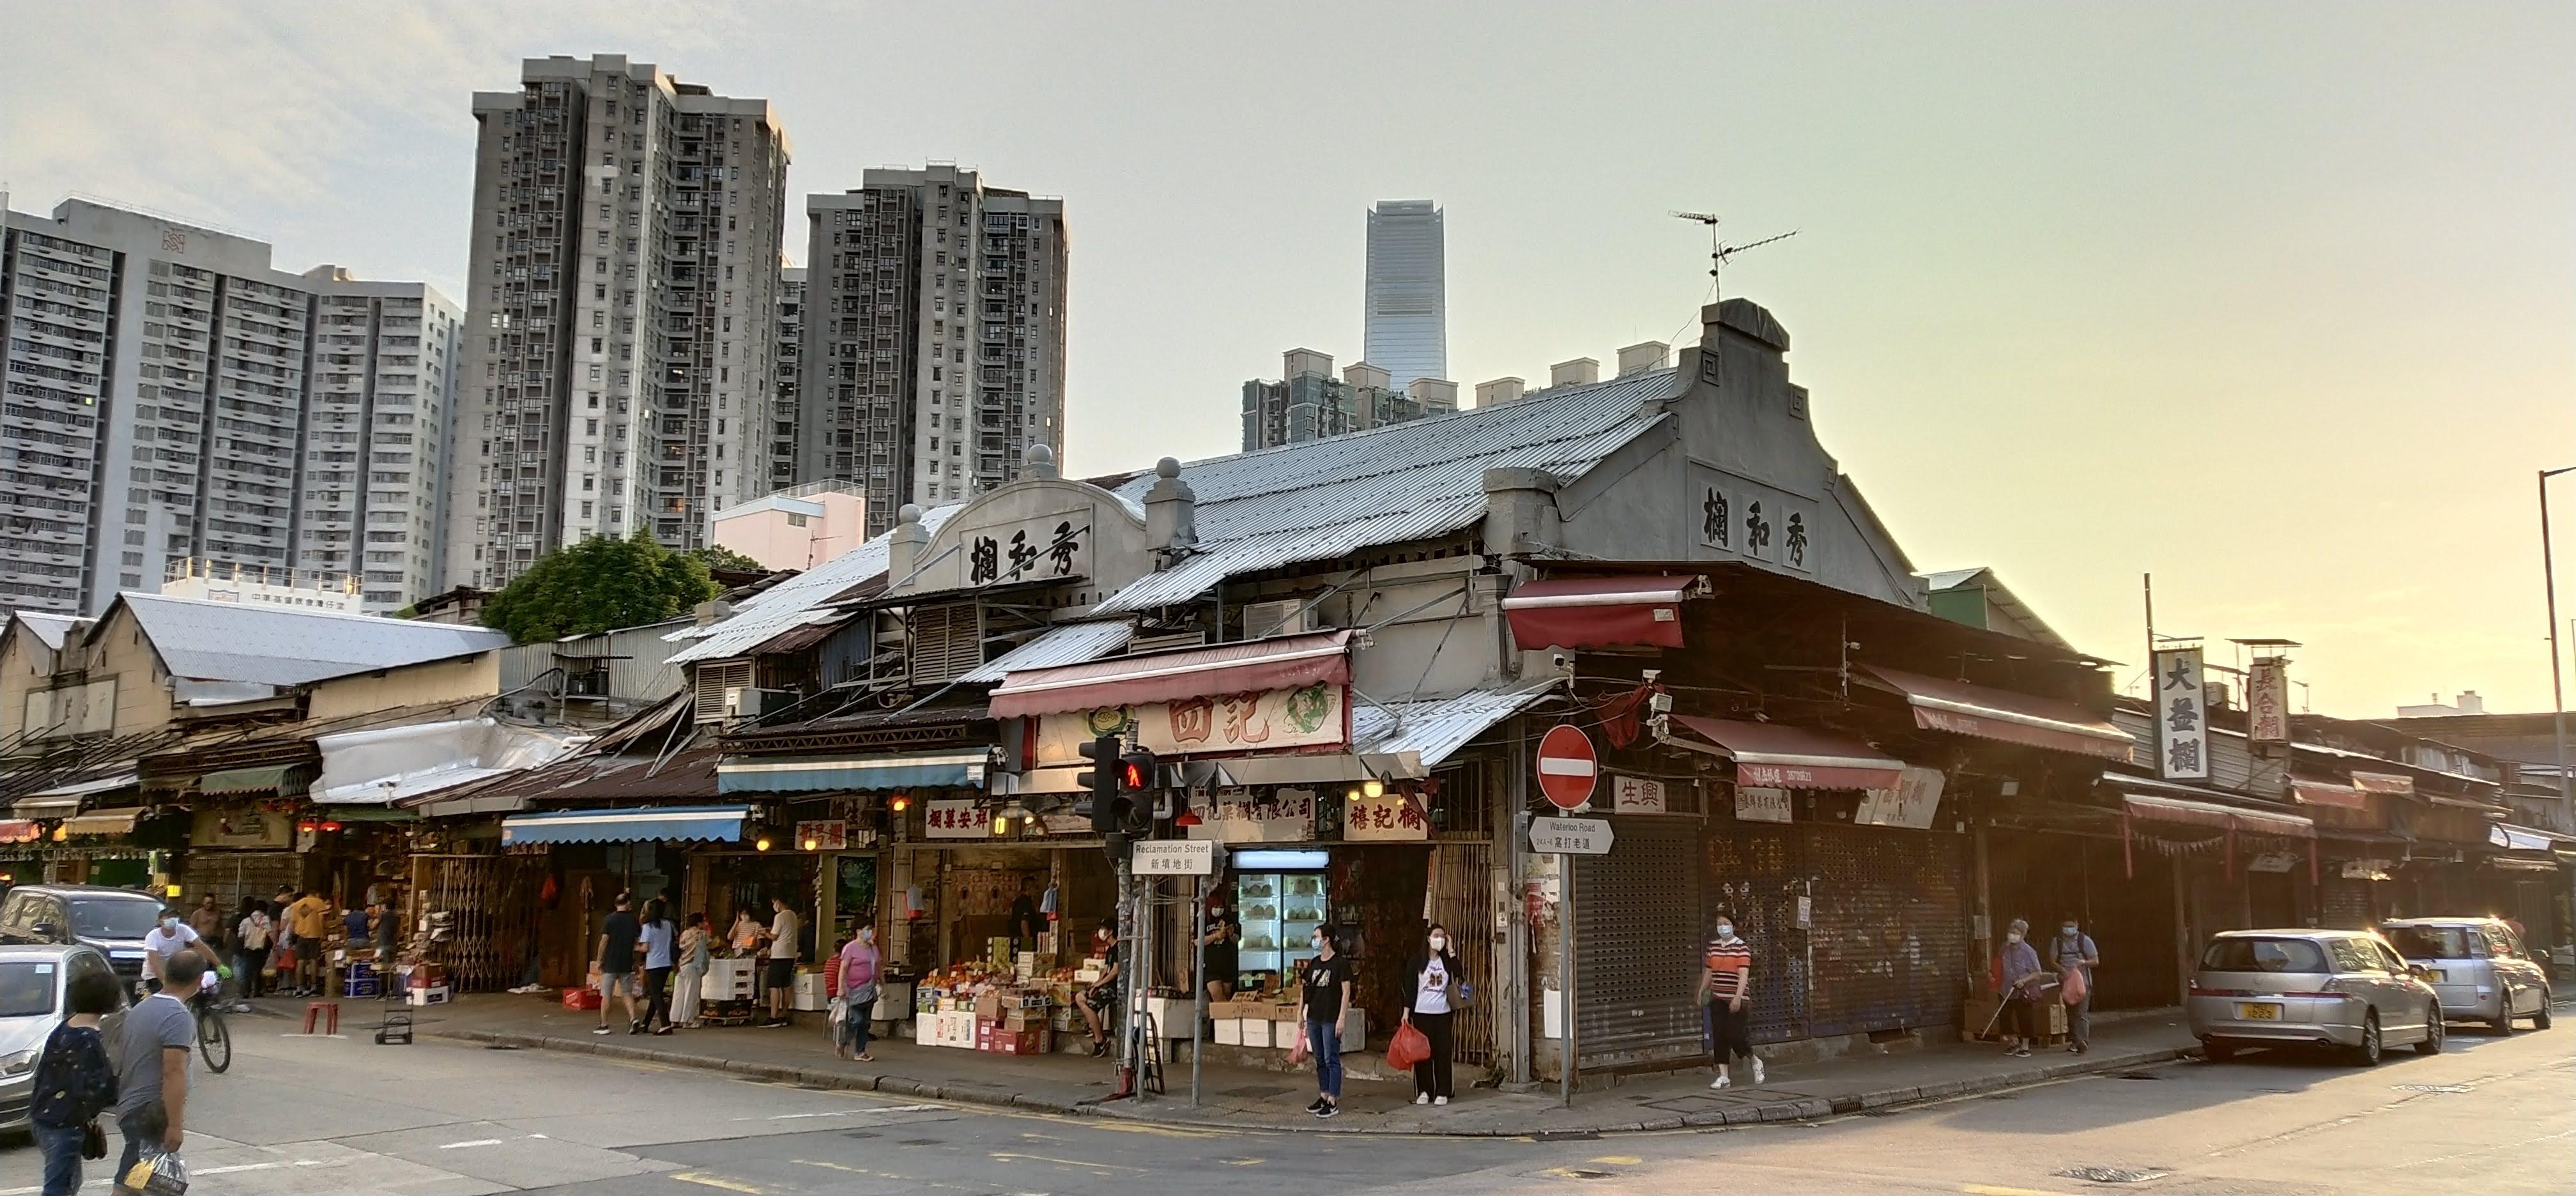 Yau Ma Tei Wholesale Fruit Market, the backdrop is the tallest ICC building